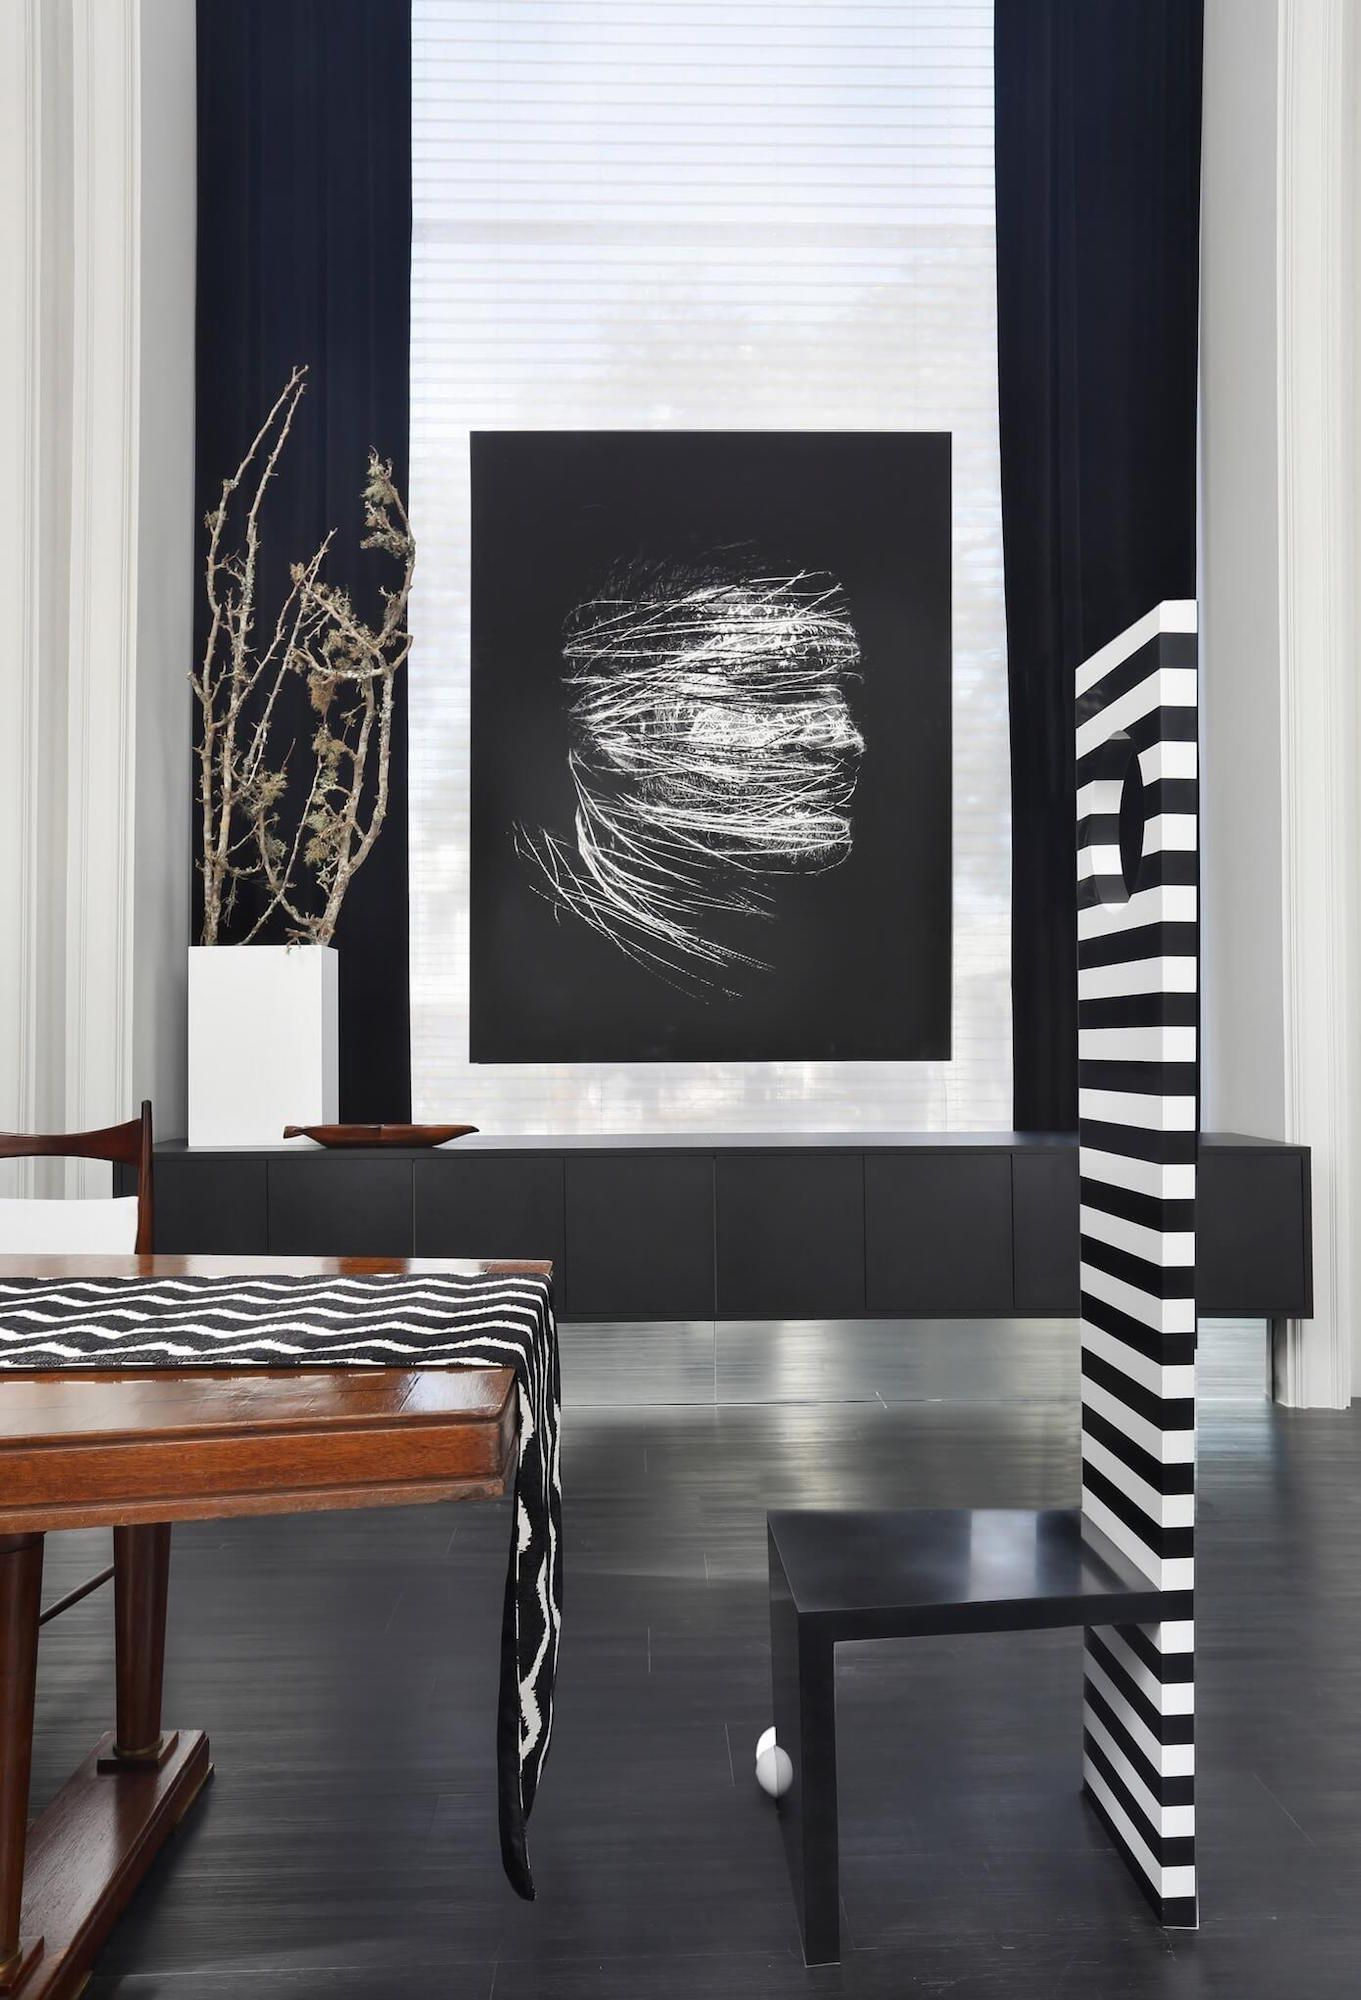 2015 Casa Cor Todeschini Pavilion-studio-guilherme-torres-21